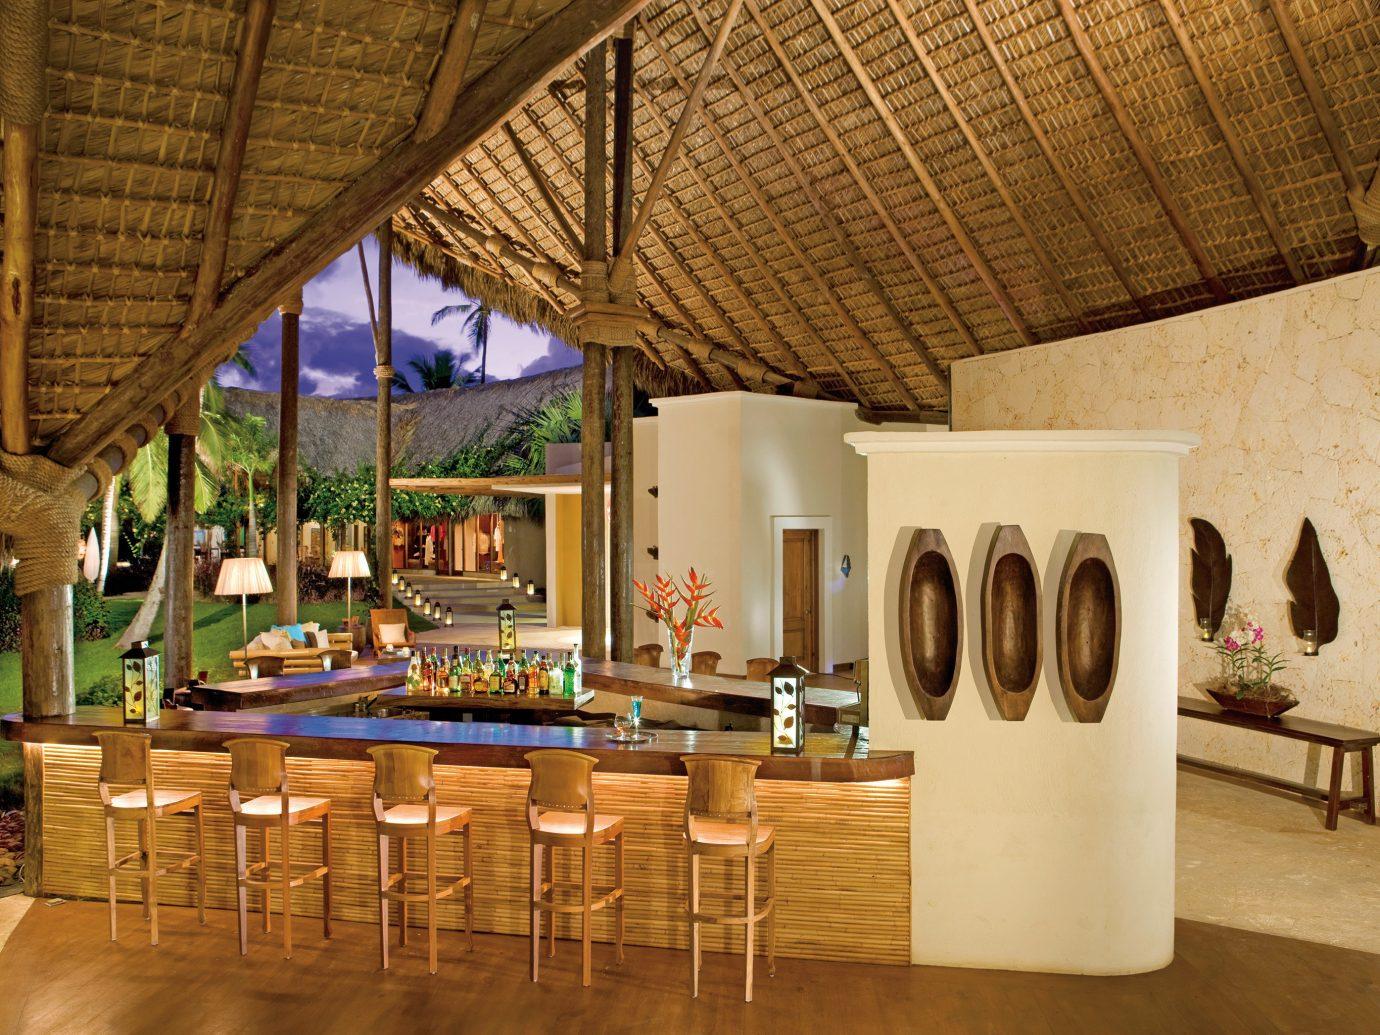 All-inclusive Bar Drink Hotels Luxury Nightlife Resort indoor floor property room estate interior design home wood Villa Design living room furniture area